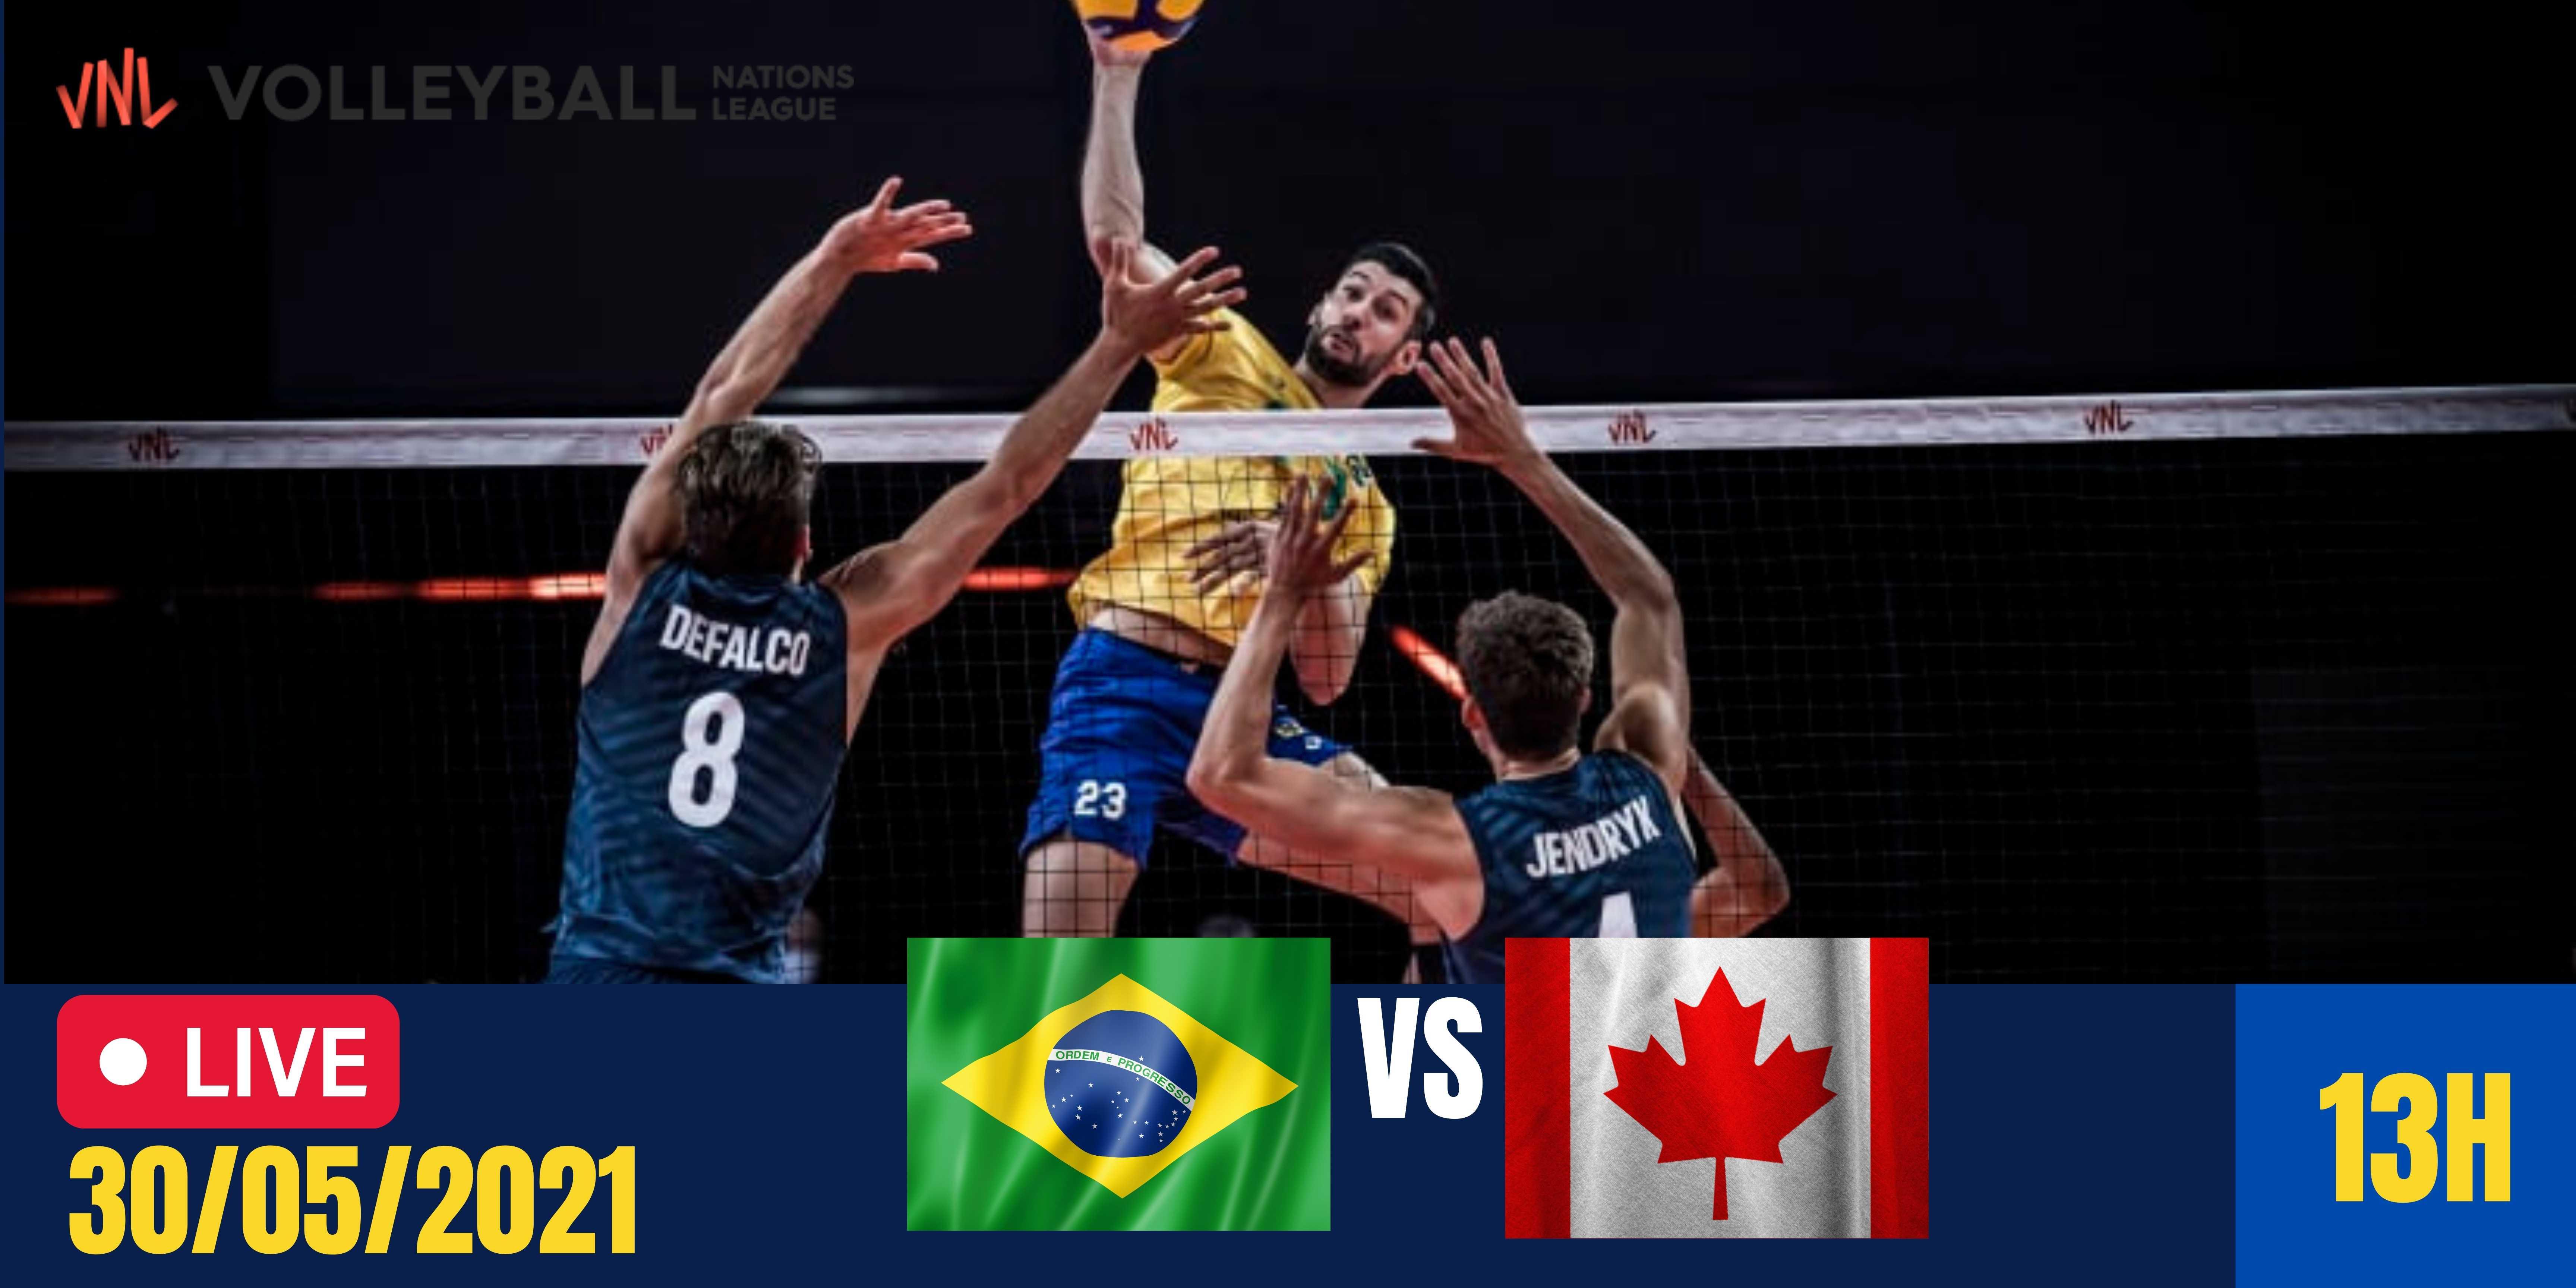 Resultado: Brasil vs Canadá – Liga das Nações Masculina – 30/05/2021